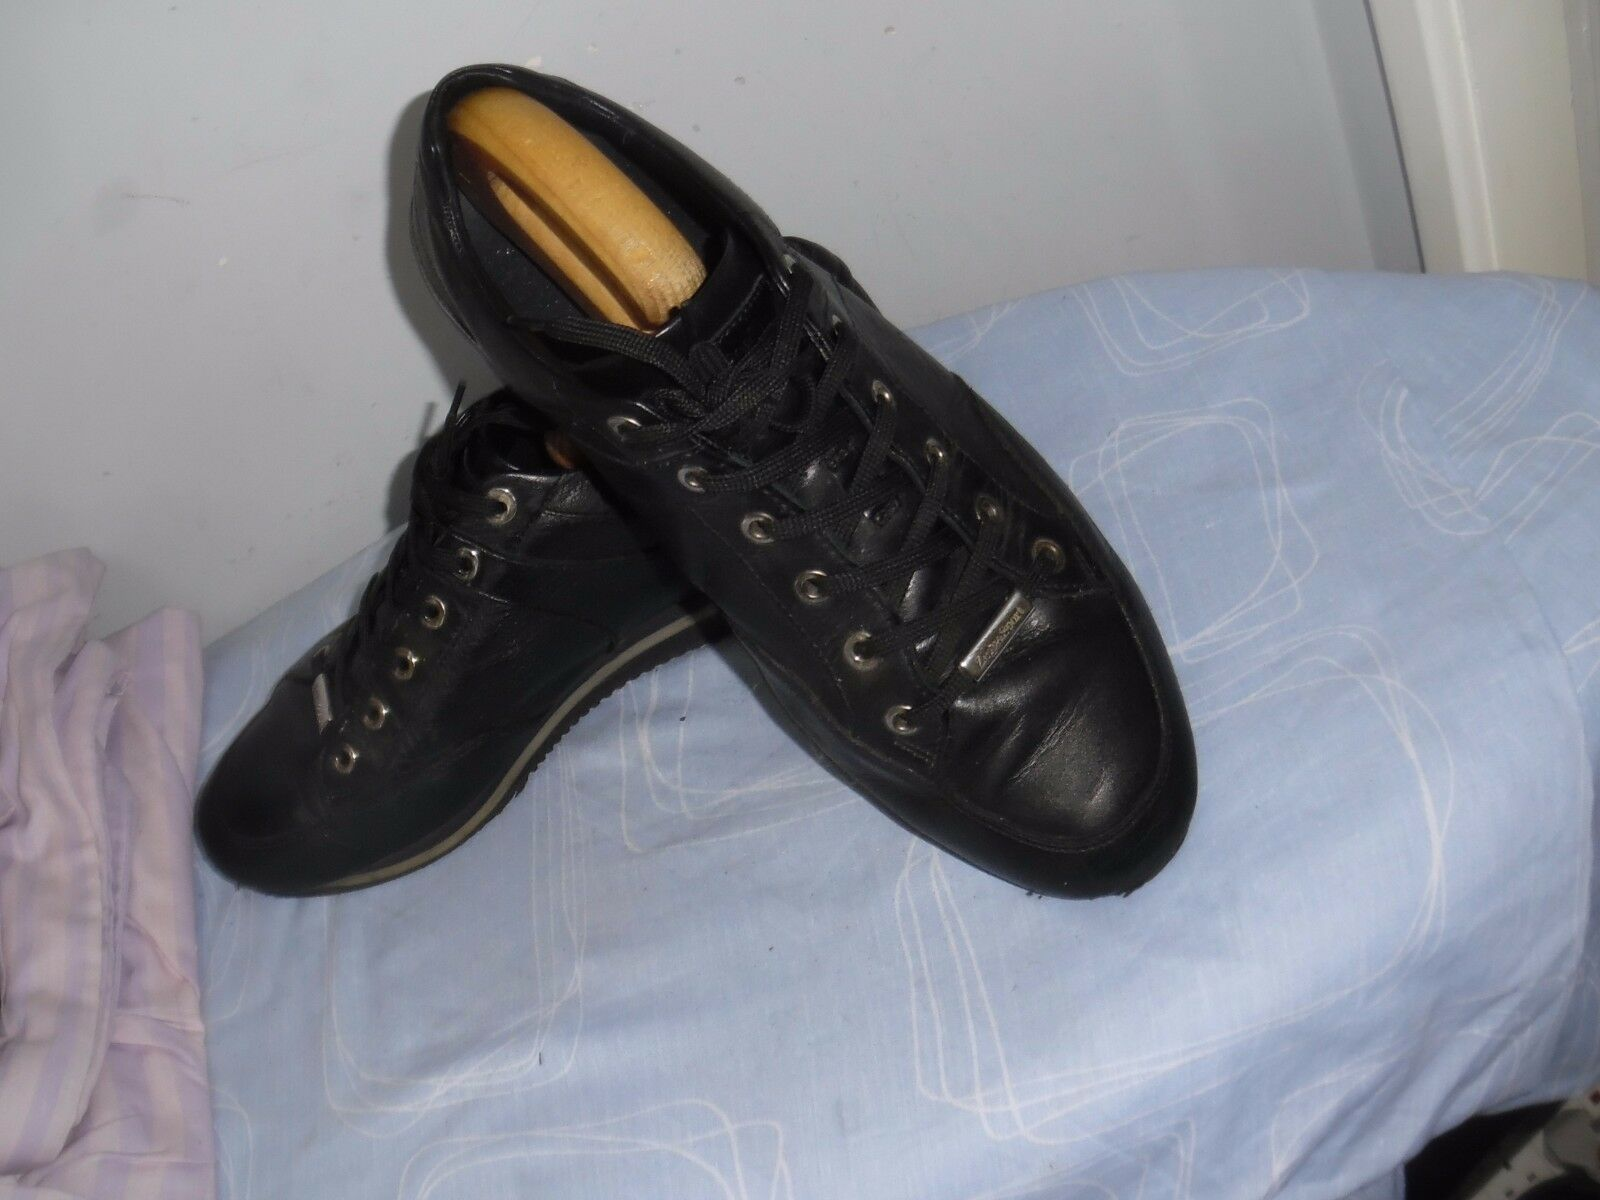 Herren LACE-UP ZEGNA SPORT BLACK LEATHER LACE-UP Herren Schuhe SIZE UK 12 803541